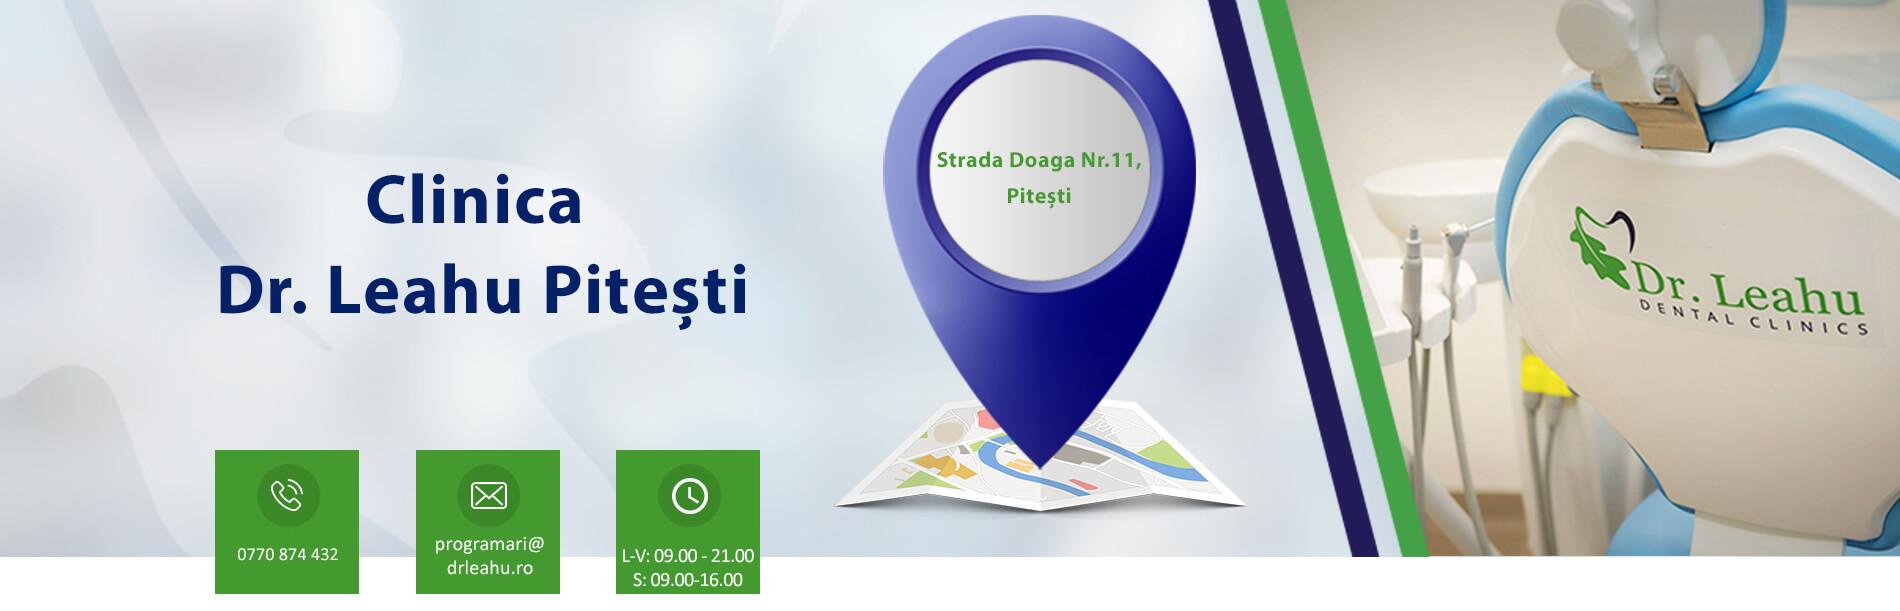 Banner cabinet si contact clinica stomatologica Pitesti - Dr. Leahu